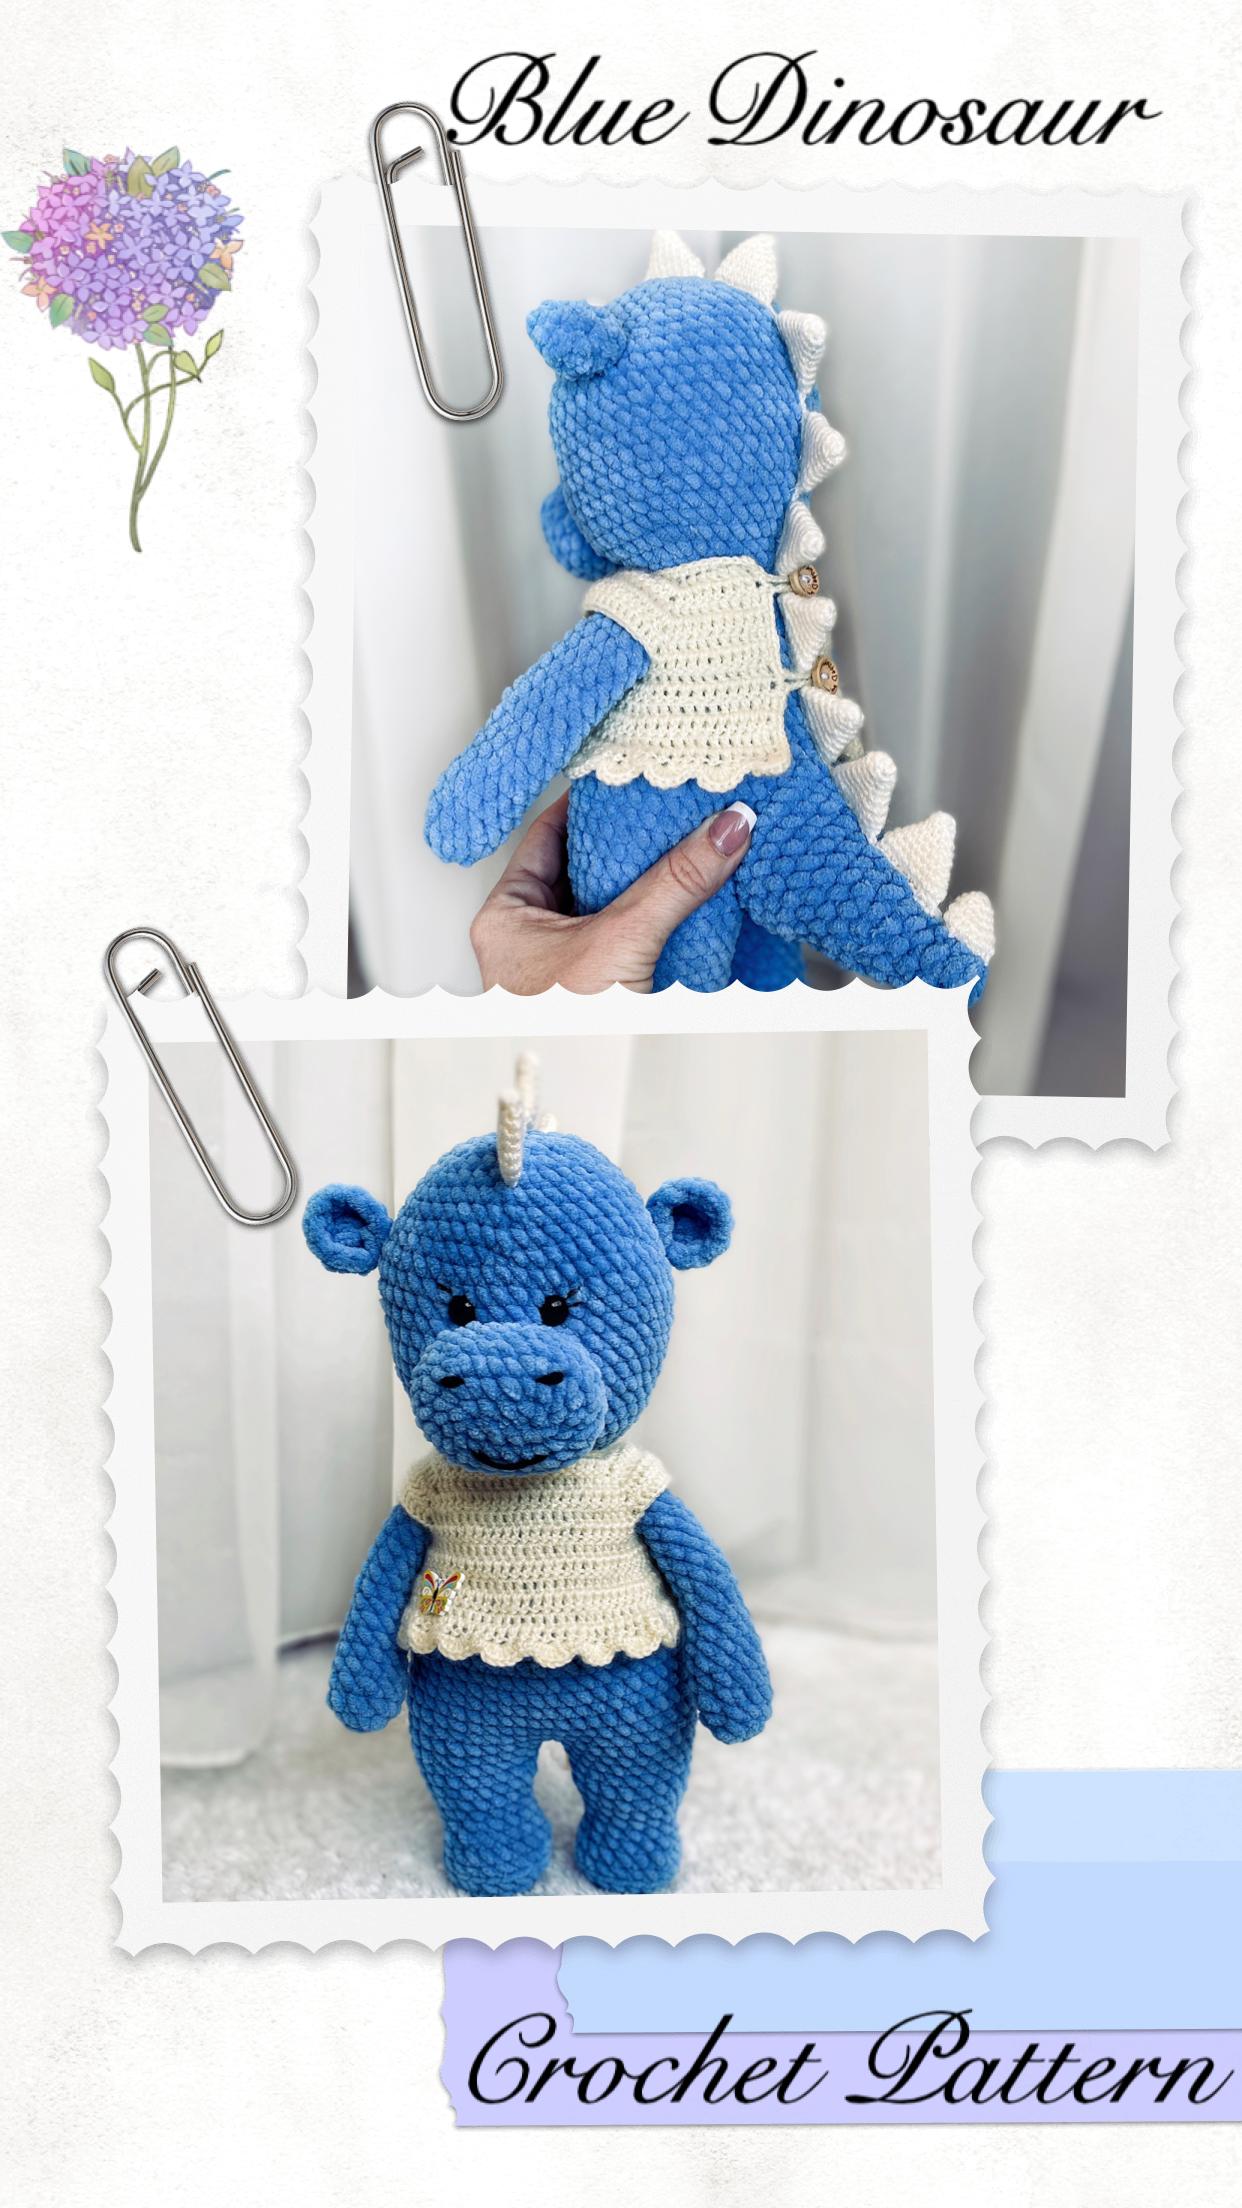 Crochet Pattern Blue Dragon Plush/Crochet Dinosaur Amigurumi | Etsy